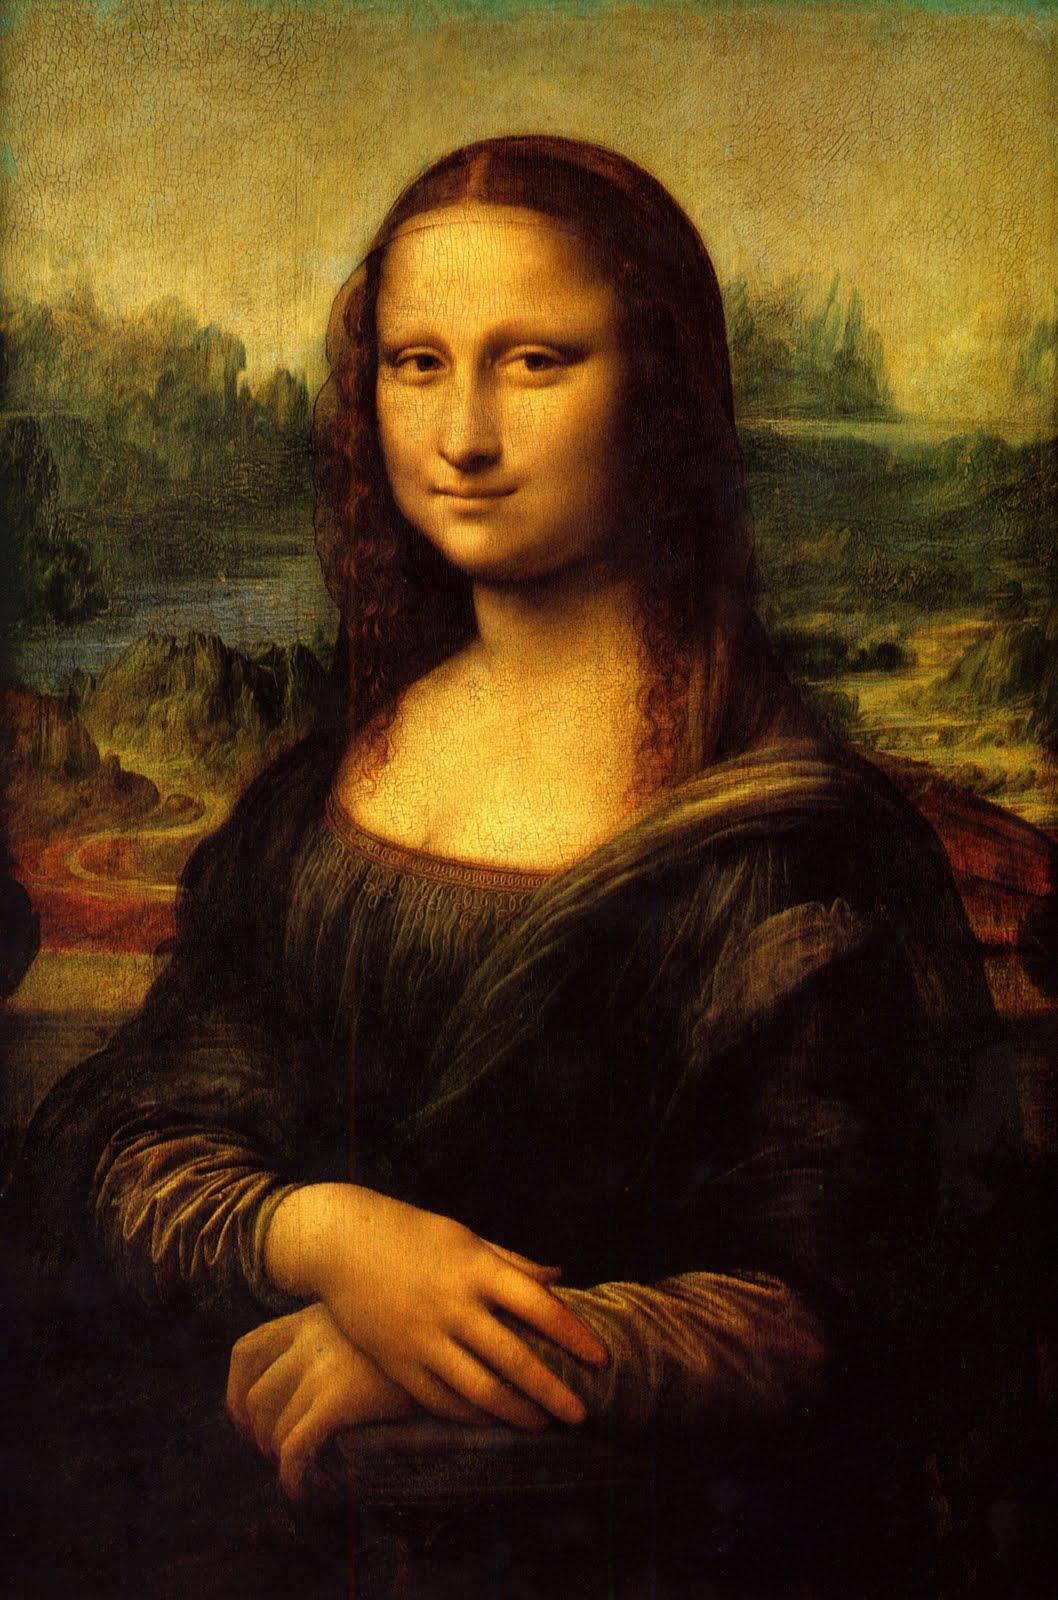 Les peintres célèbres